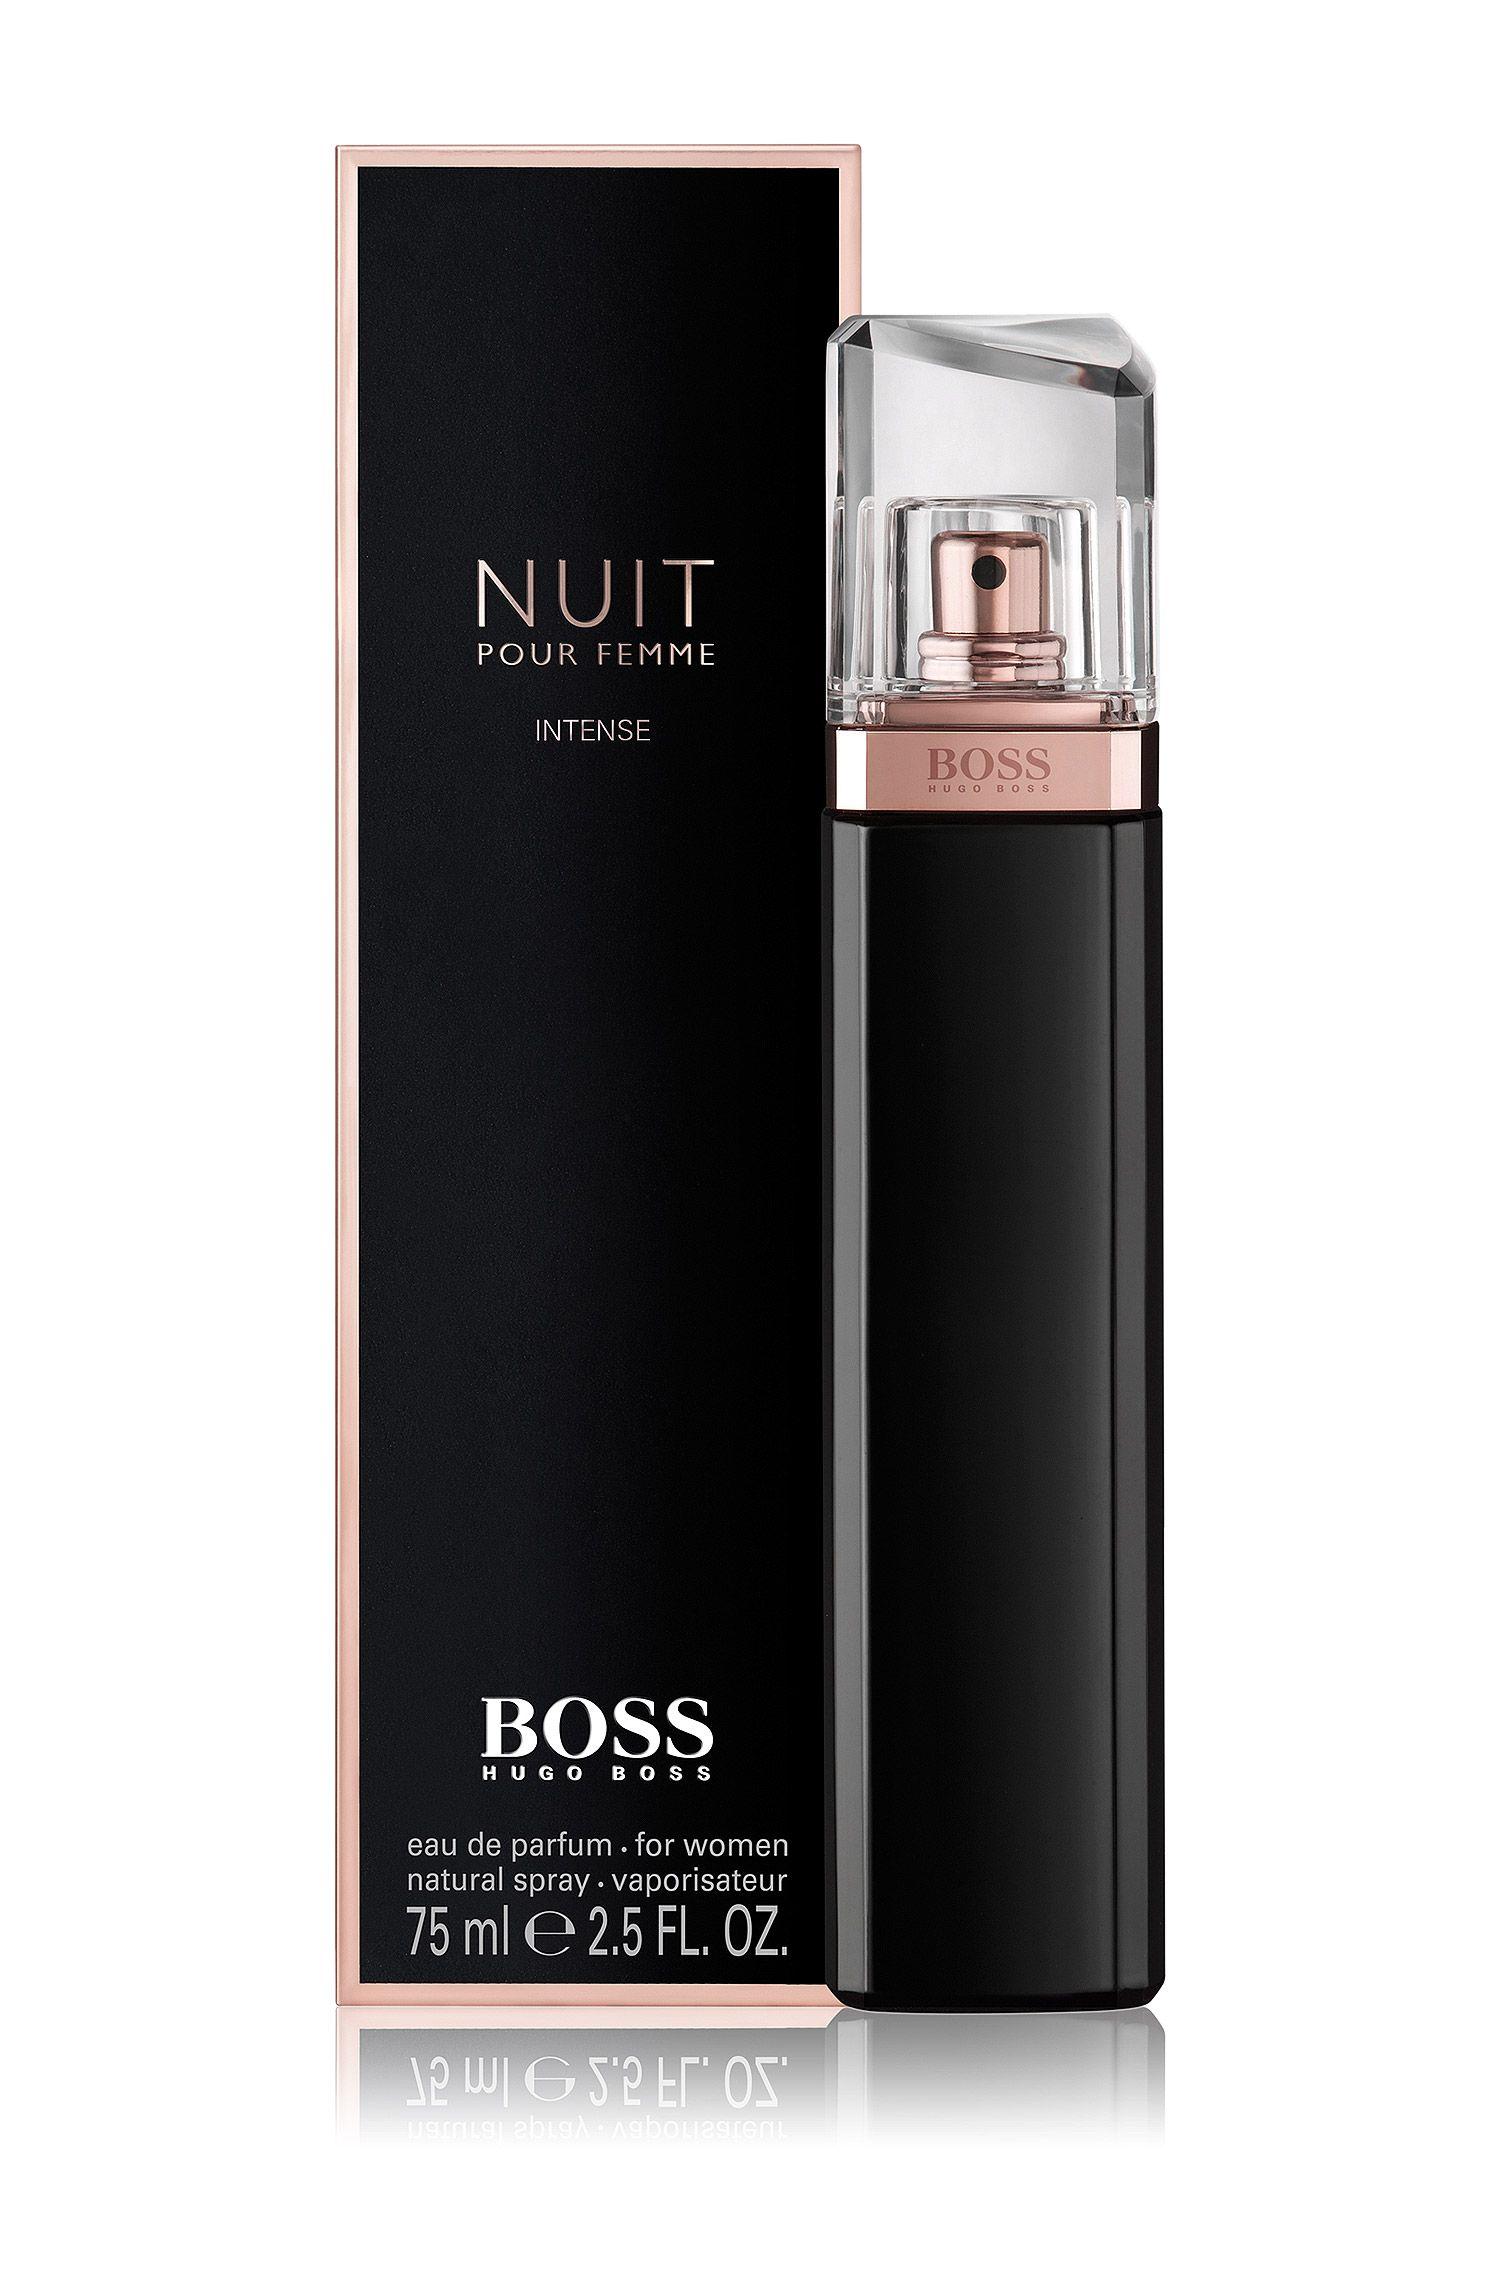 BOSS Nuit Intense Eau de Parfum 75 ml